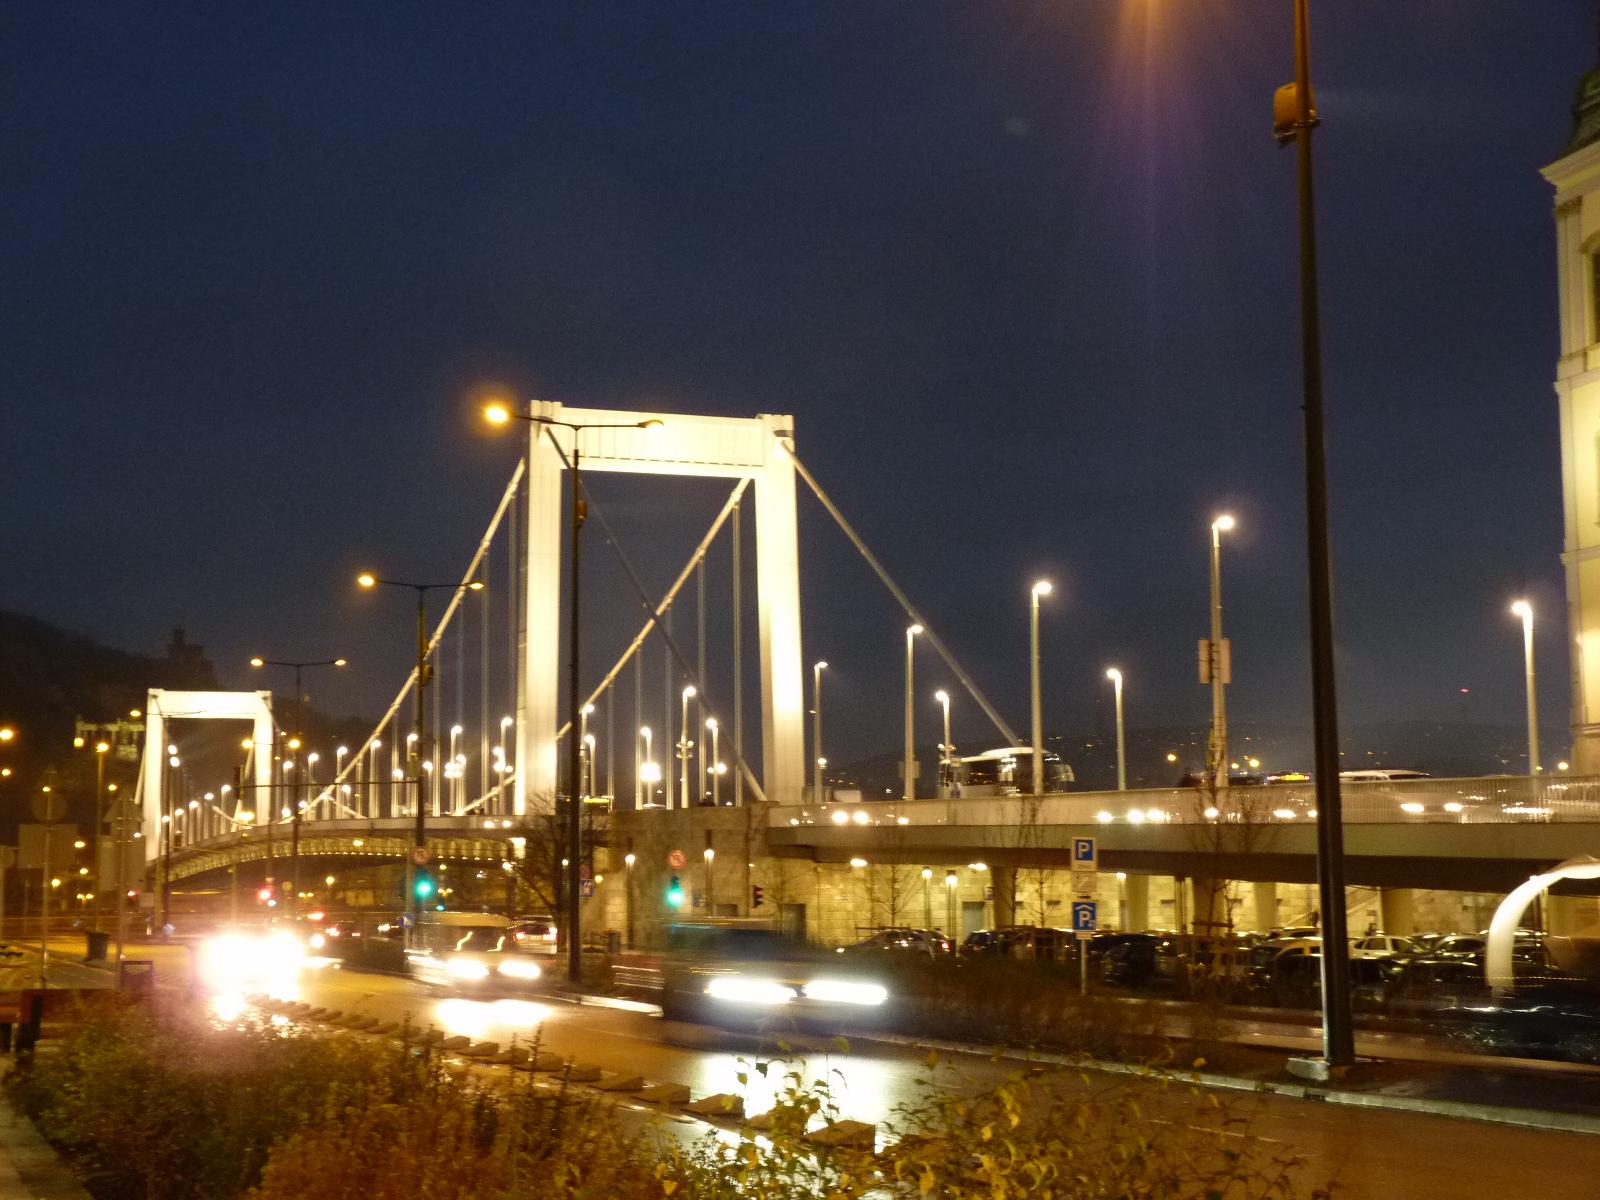 Brücke, beleuchtet